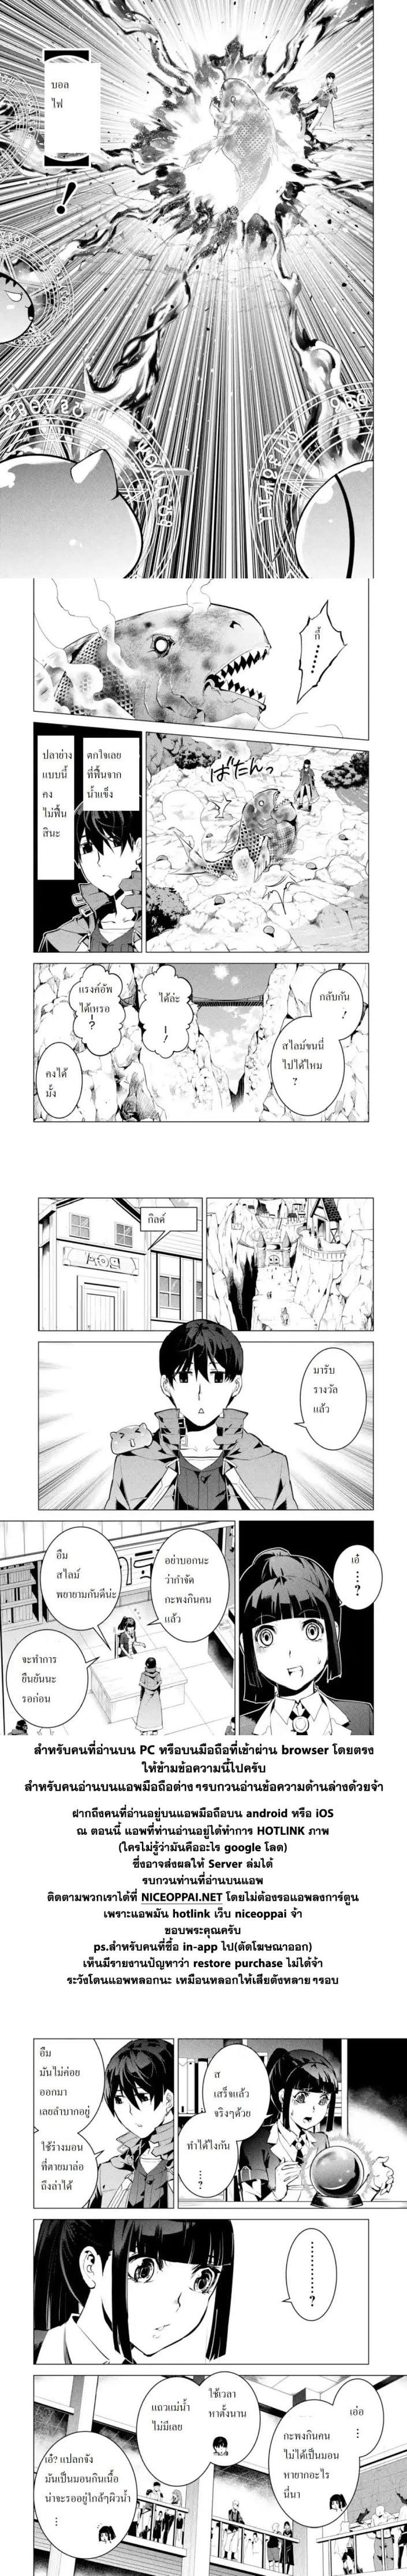 Tensei Kenja no Isekai Life ตอนที่ 17.4 TH แปลไทย